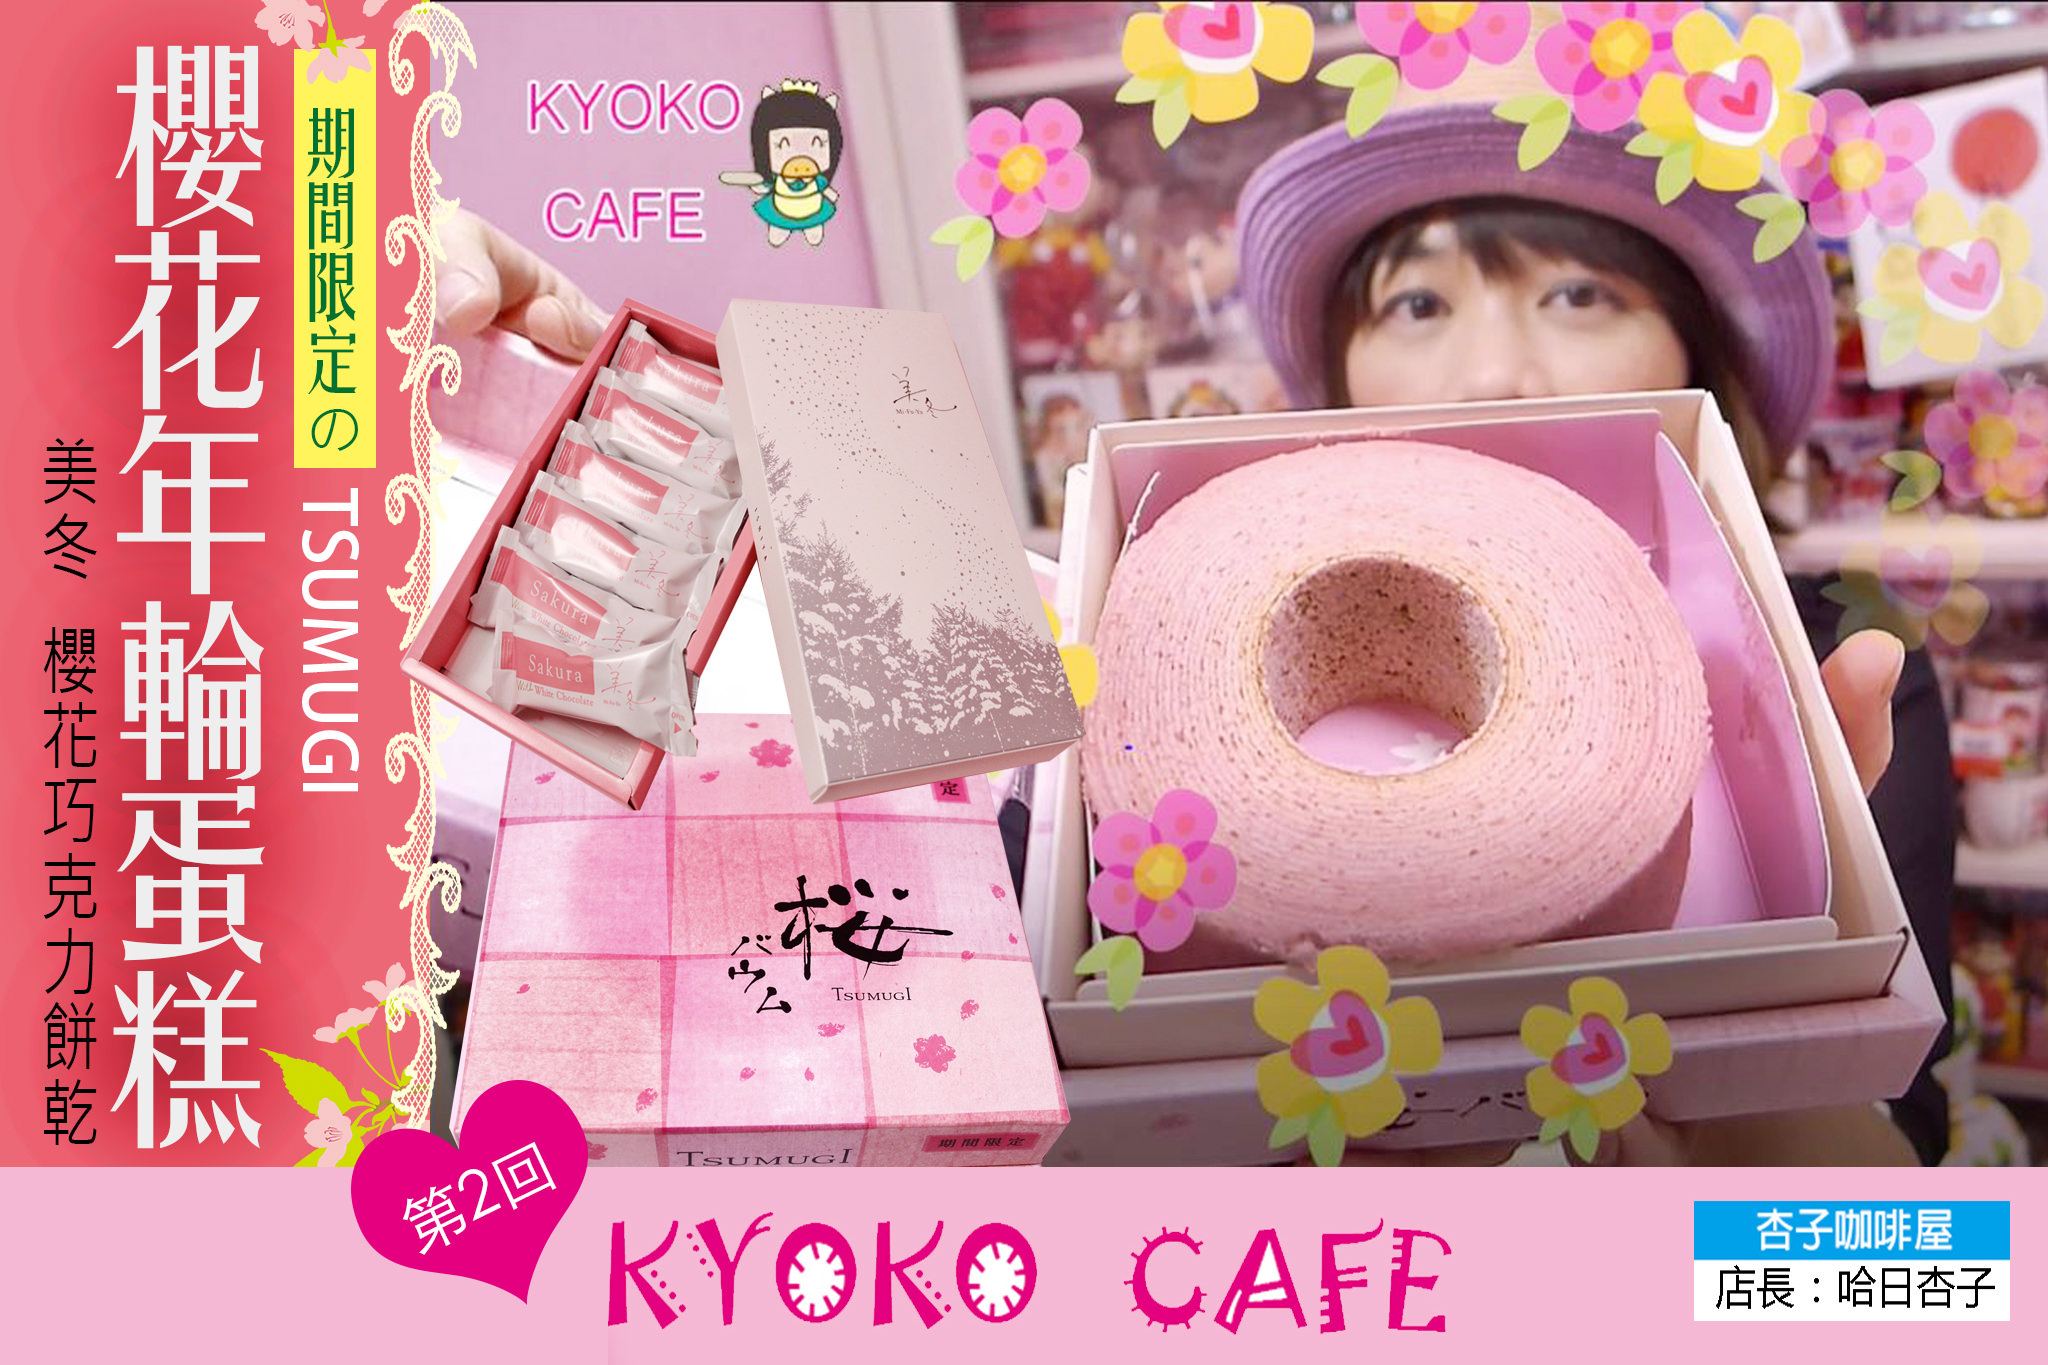 【KYOKO   CAFE】 第2回|春季限定*TSUMUGI 櫻花年輪蛋糕&美冬櫻花巧克力